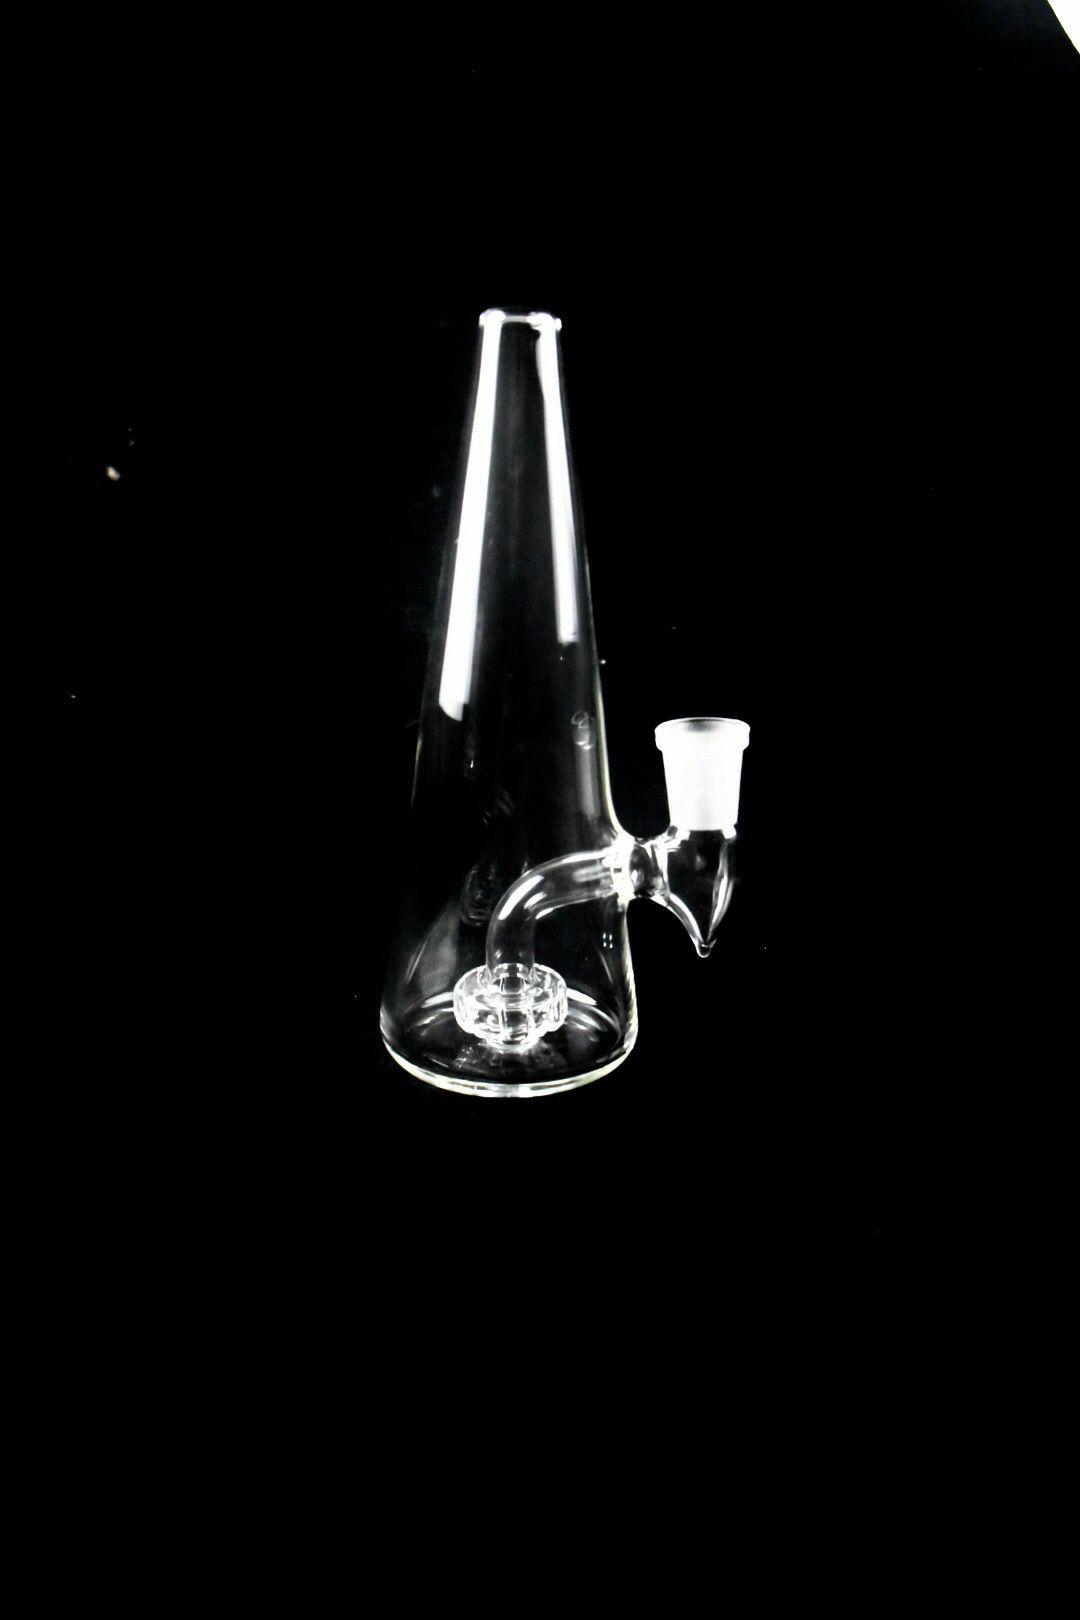 Neue Art-Fabrik-Preis Heady Bongs Rig Rauchen Glaspfeifen Bunte Glas BongBig Beaker Bohrinsel 14mm Glasschüssel Schwarz